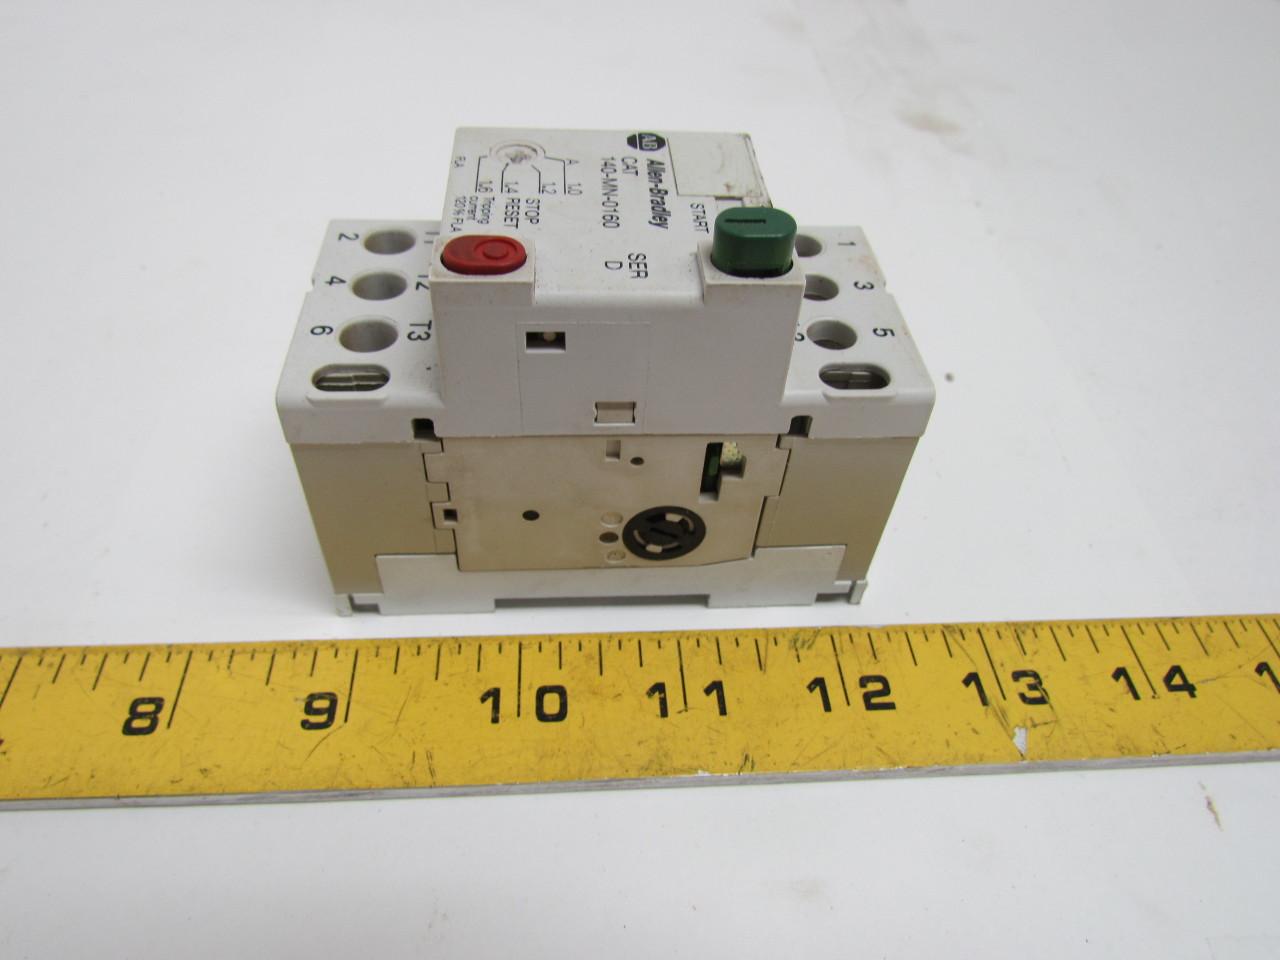 Allen bradley 140 mn 0160 series d manual motor starter 2 for Allen bradley manual motor starter